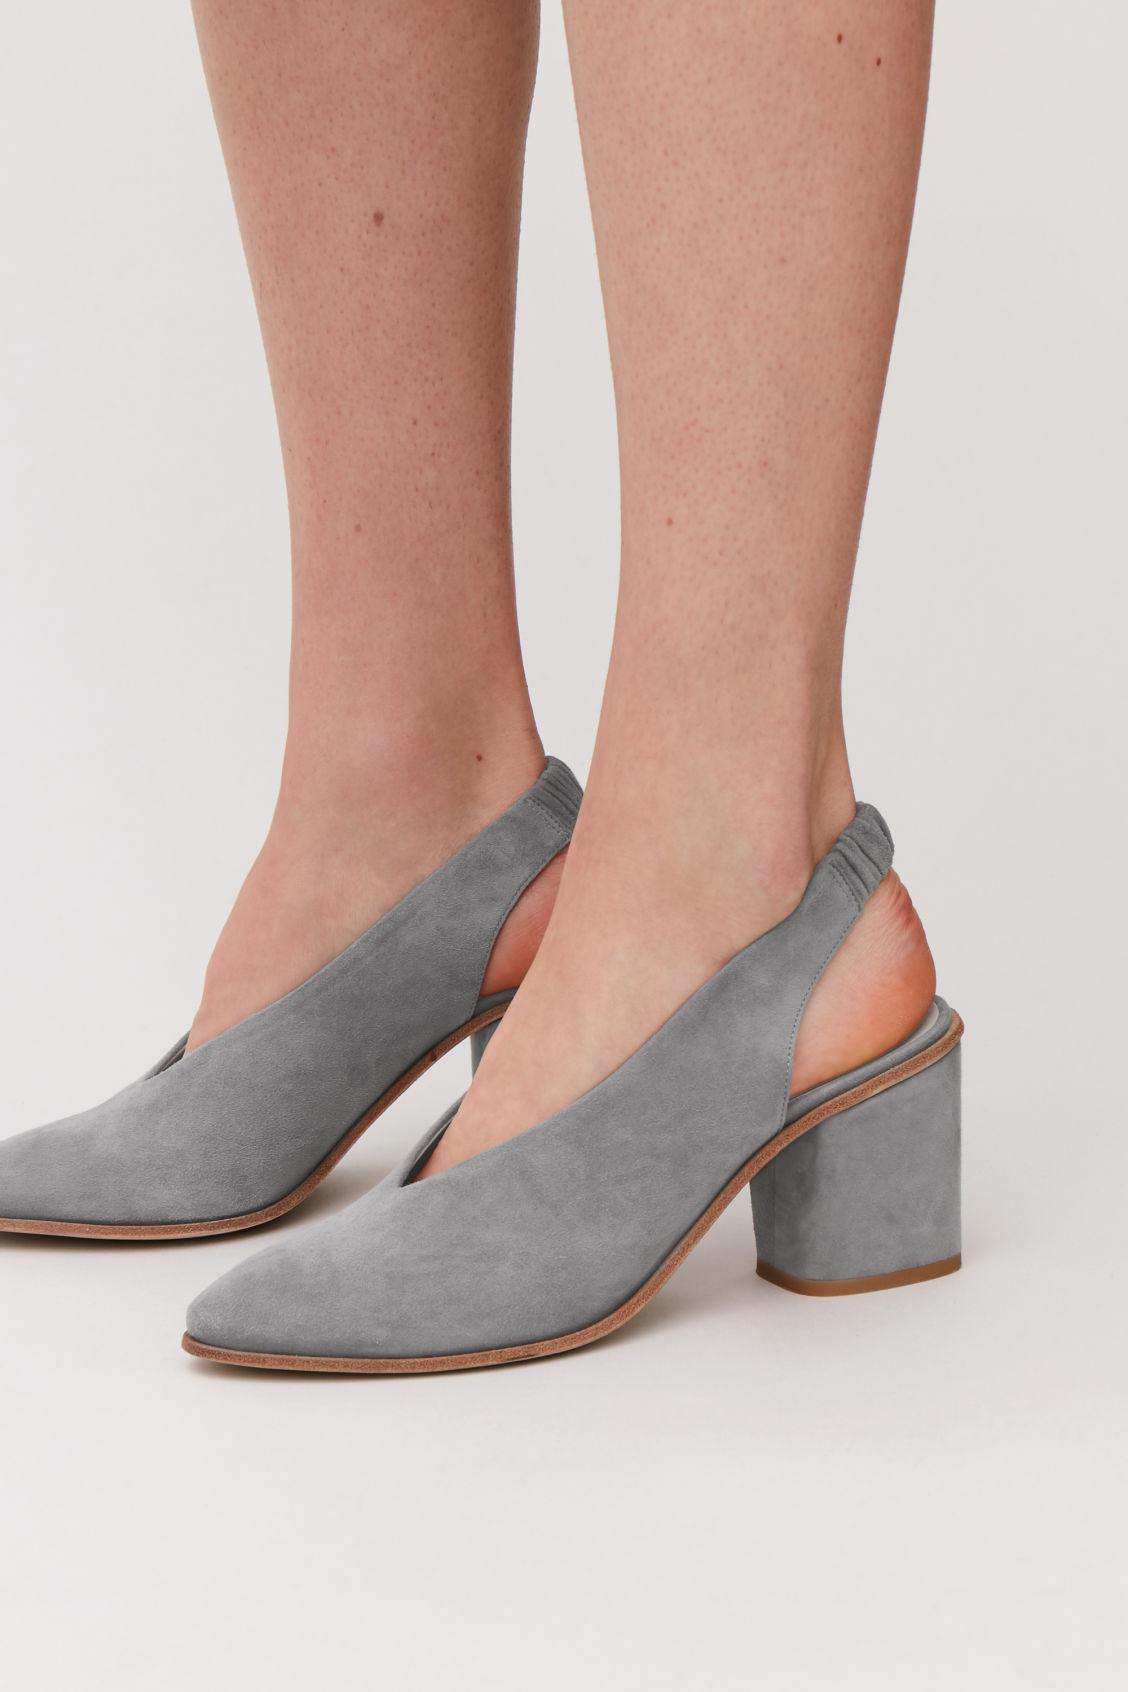 6de0991ff1e Detailed image of Cos suede slingback heels in grey